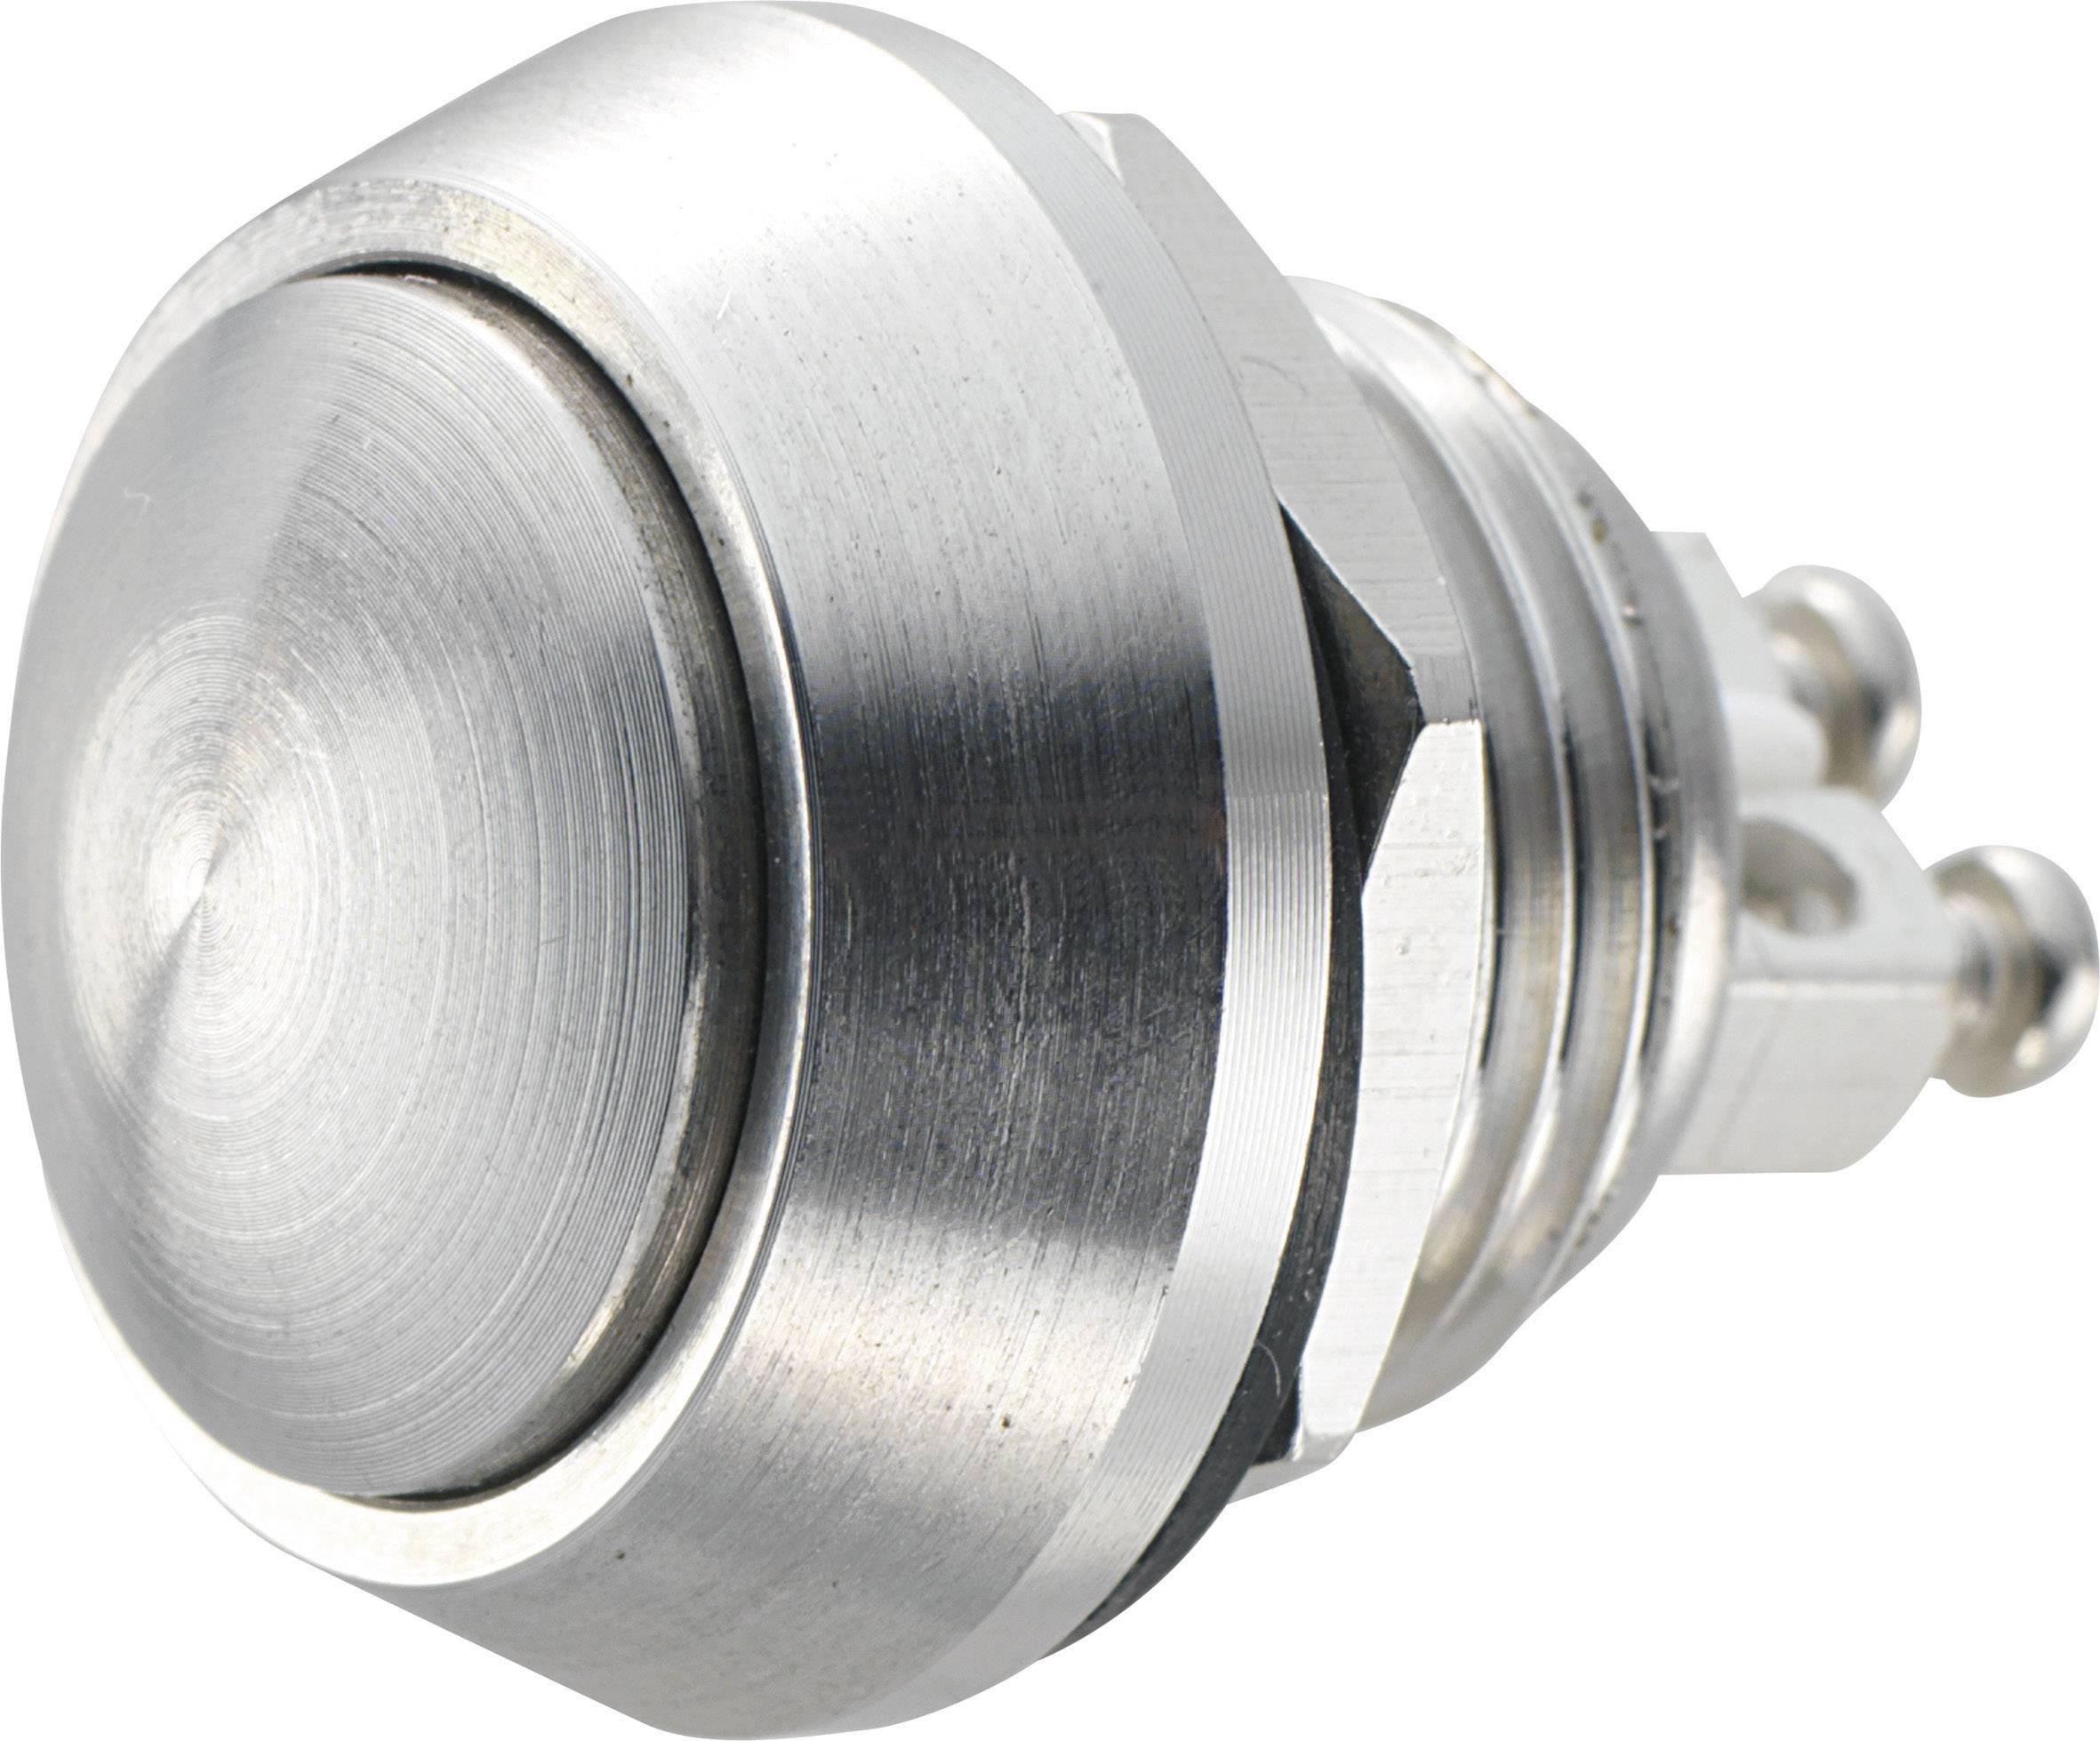 12mm LED Drucktaster Metall Druckschalter Tastschalter Edelstahl IP65 DC 12